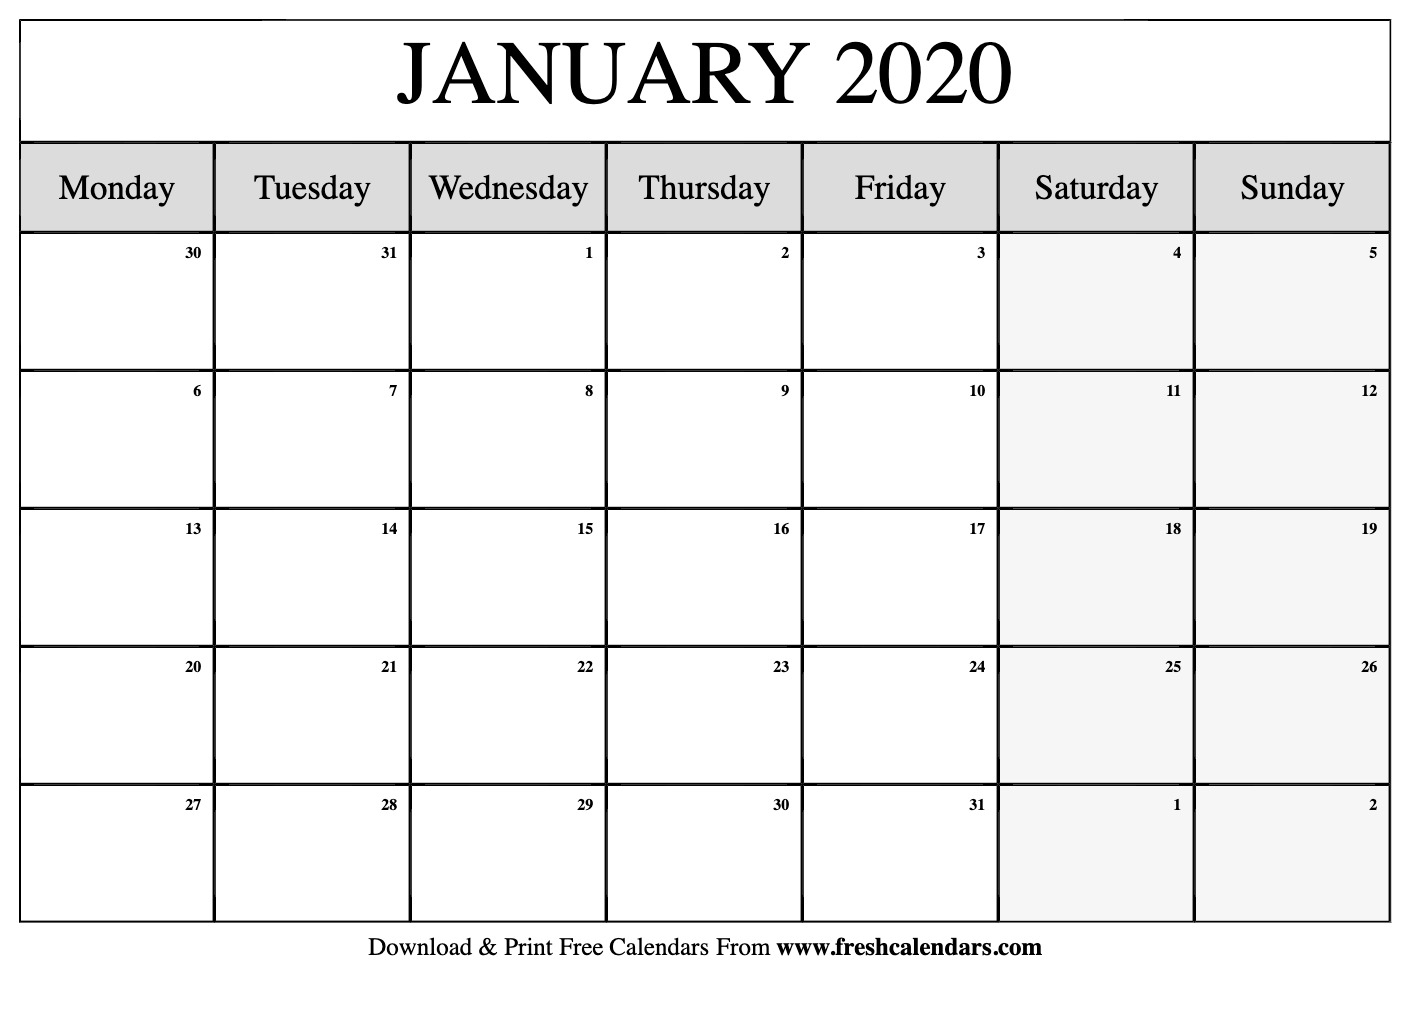 Free Printable January 2020 Calendar with regard to Printable Calendar 2020 Monday Start